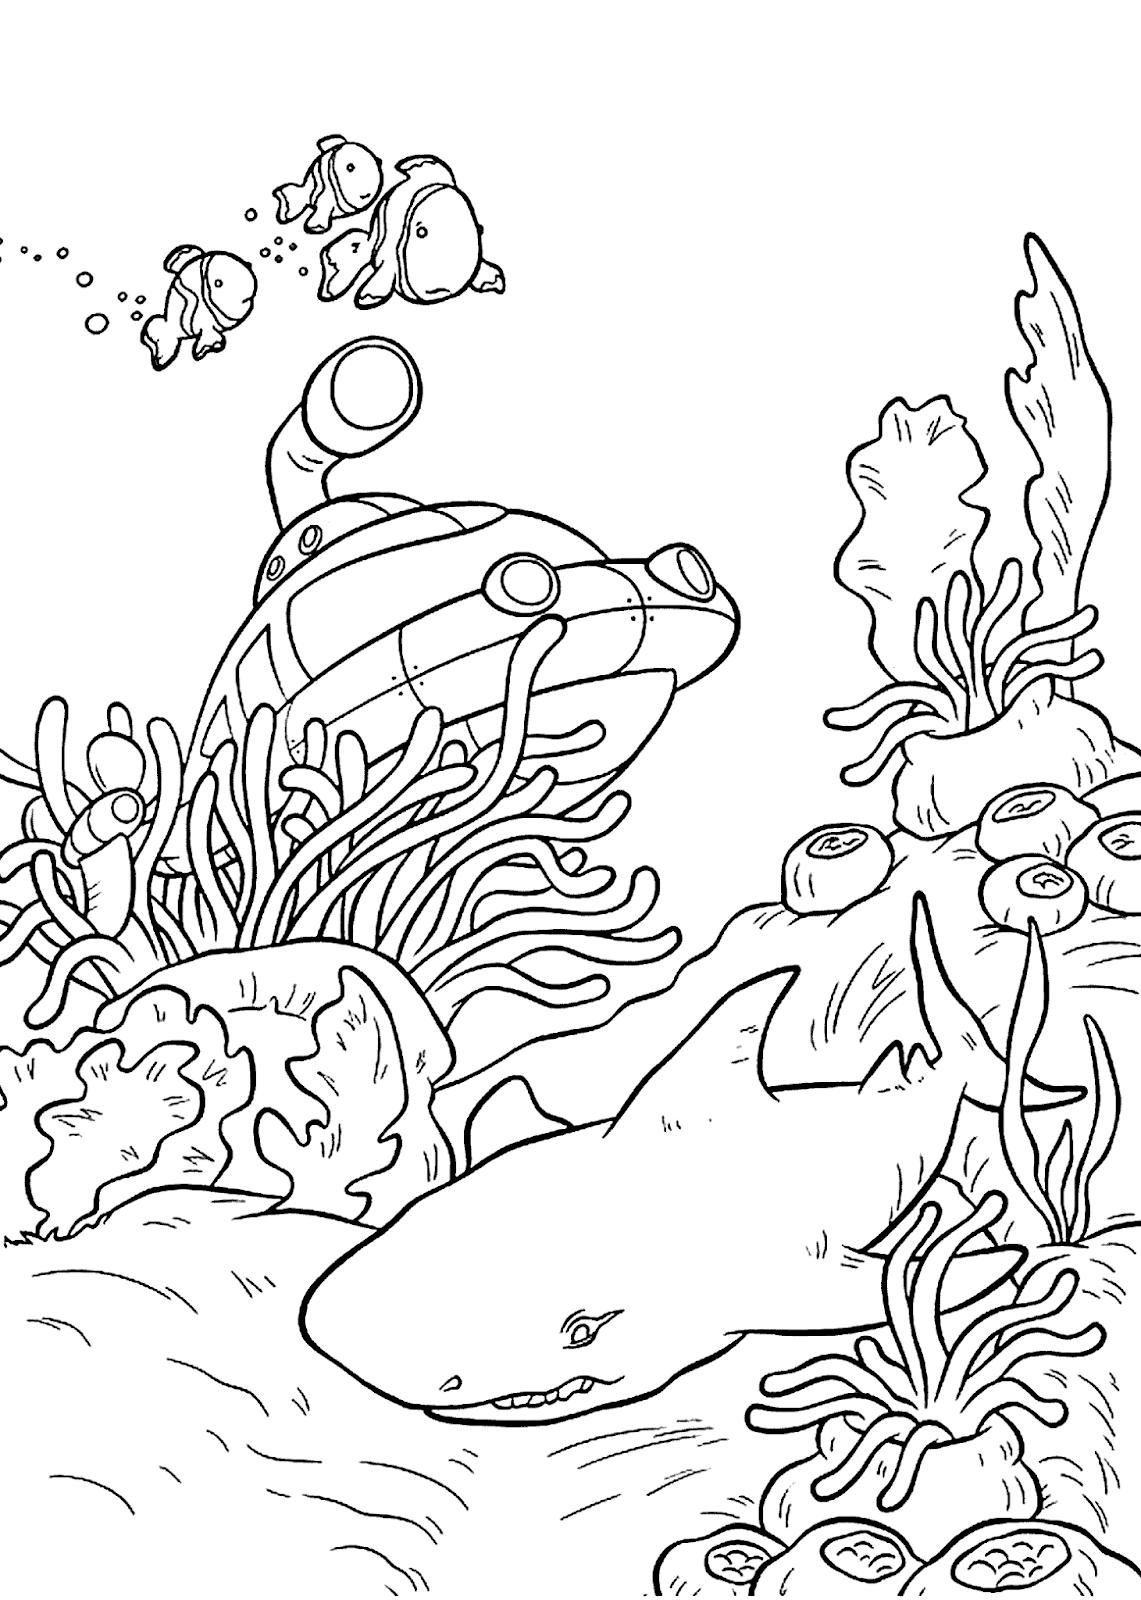 110 Sketsa Gambar Pemandangan Bawah Laut